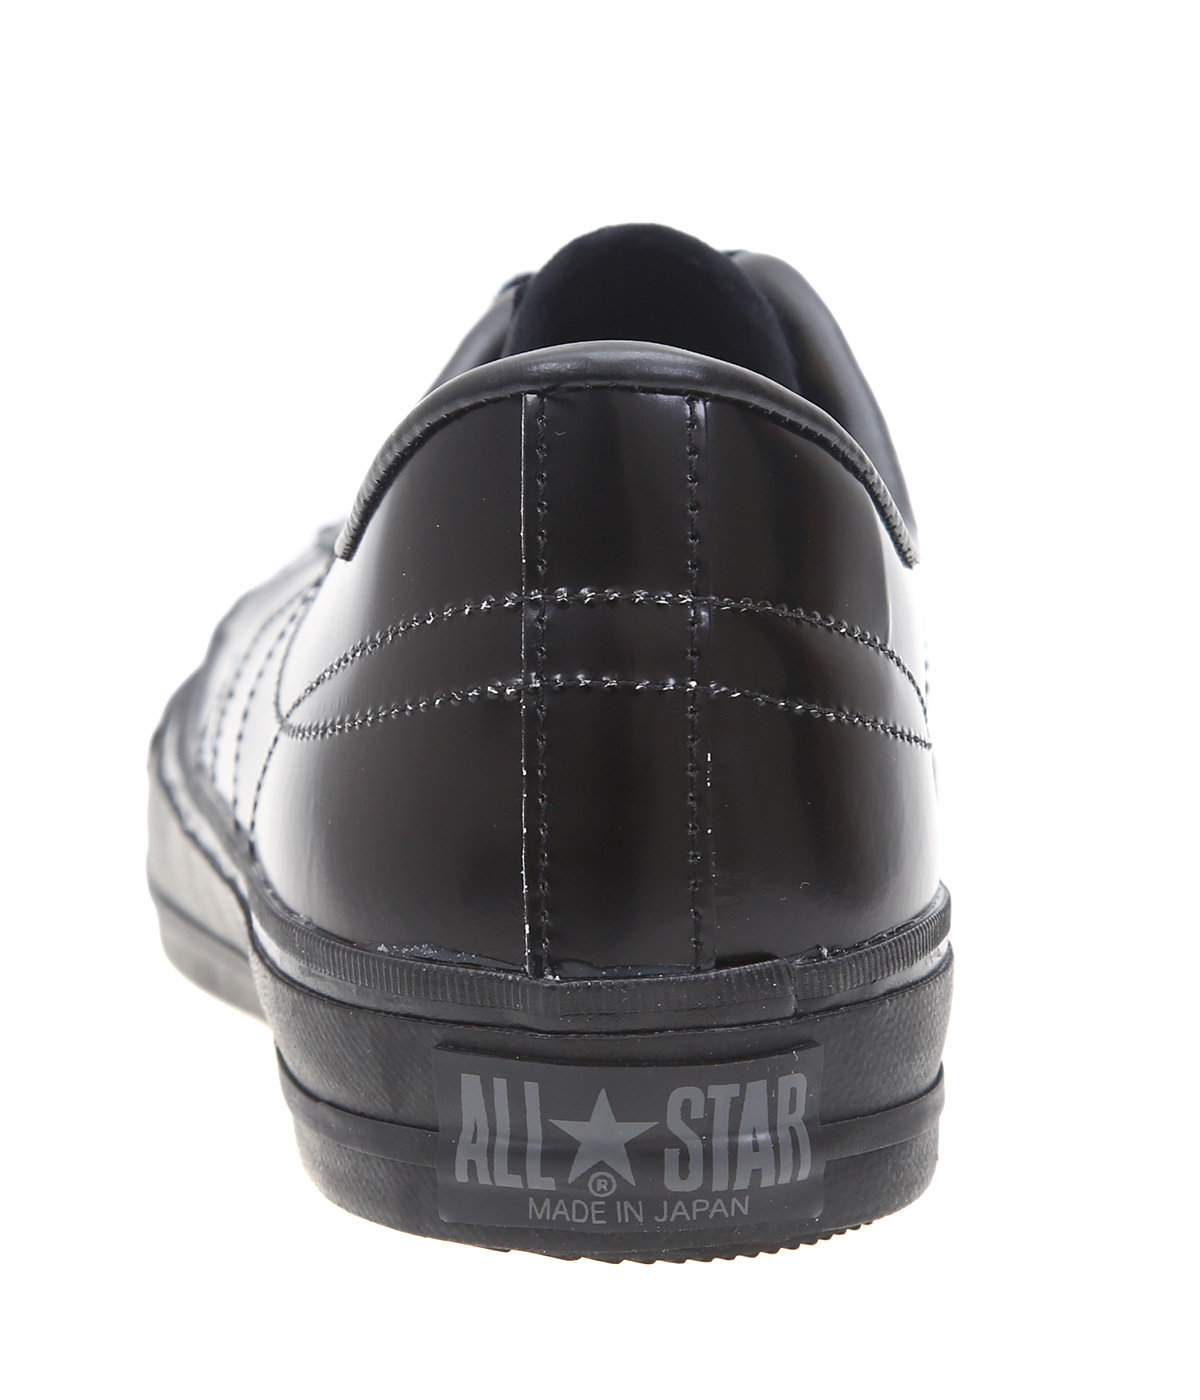 ONE STAR J